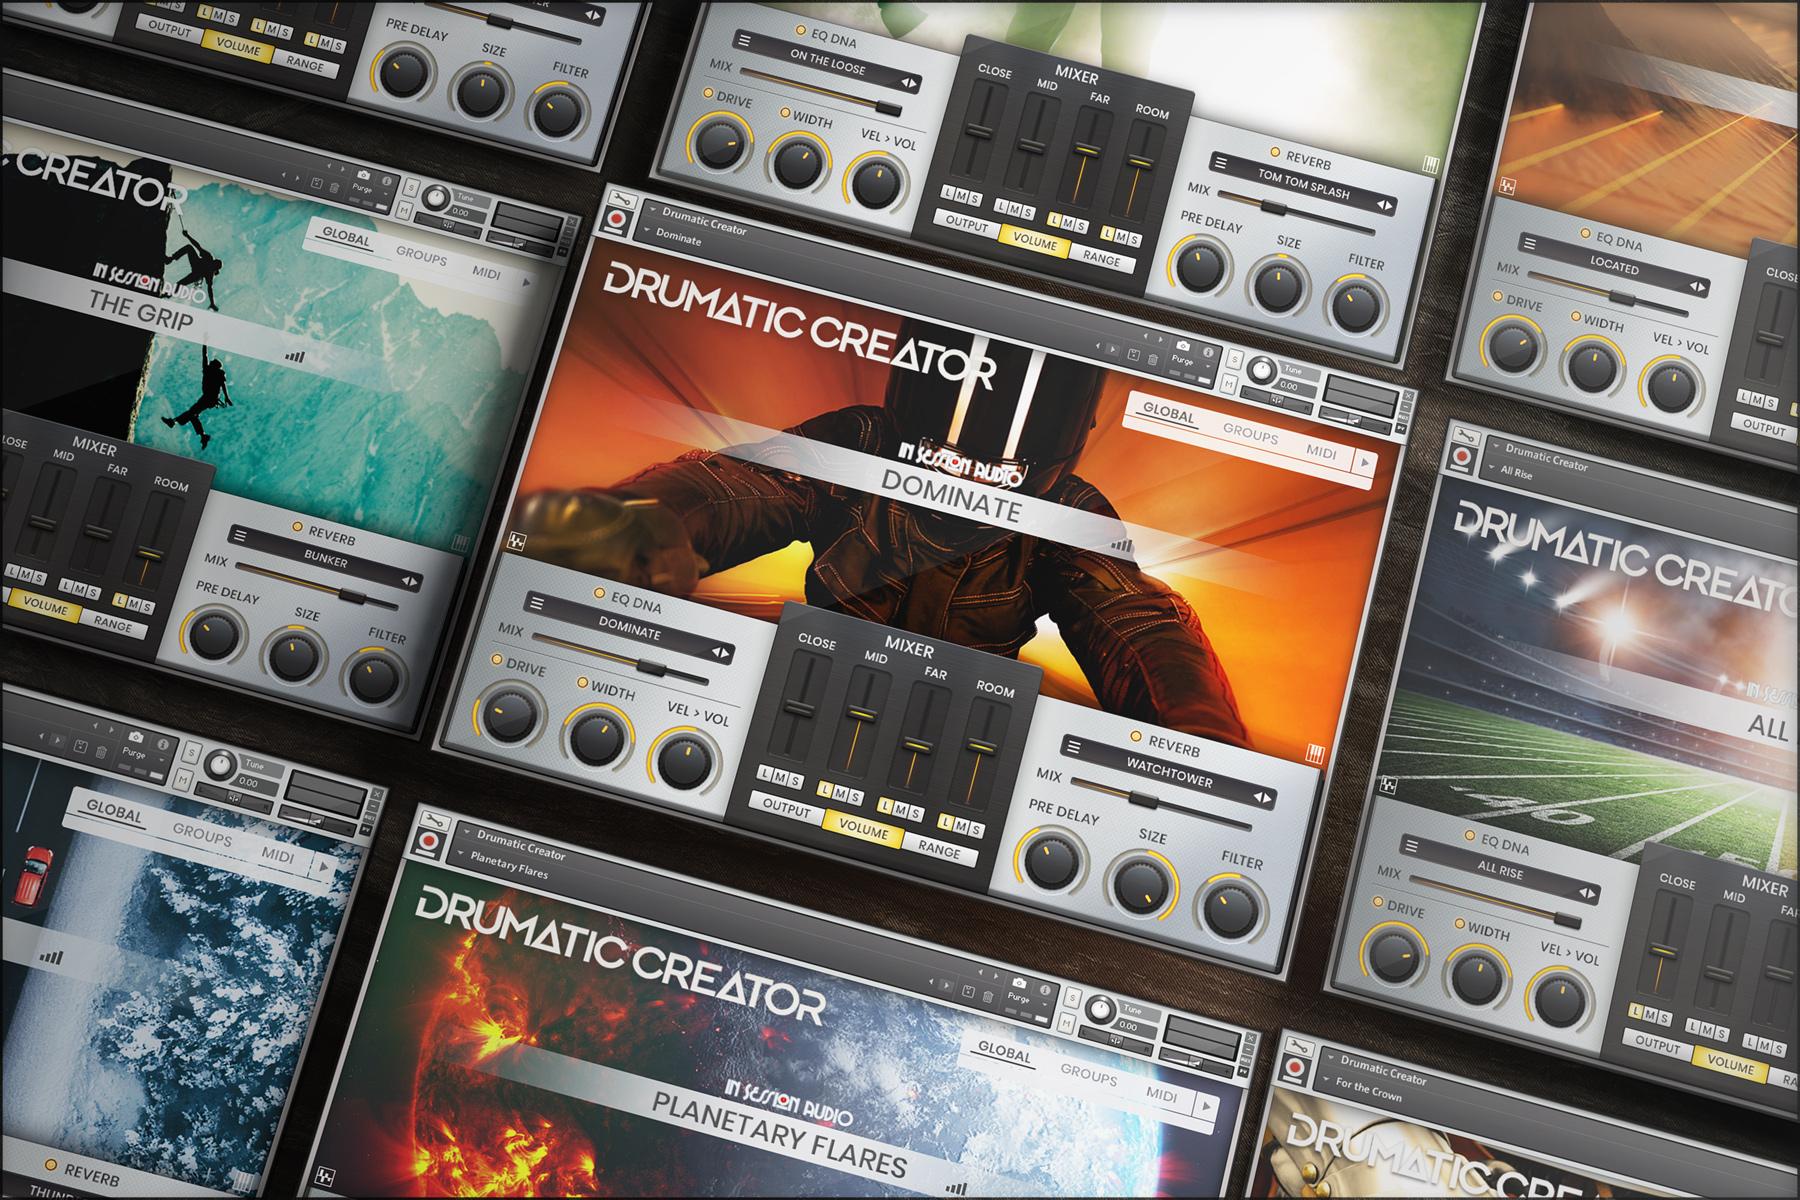 Drumatic-Creator-Compilation-1800x